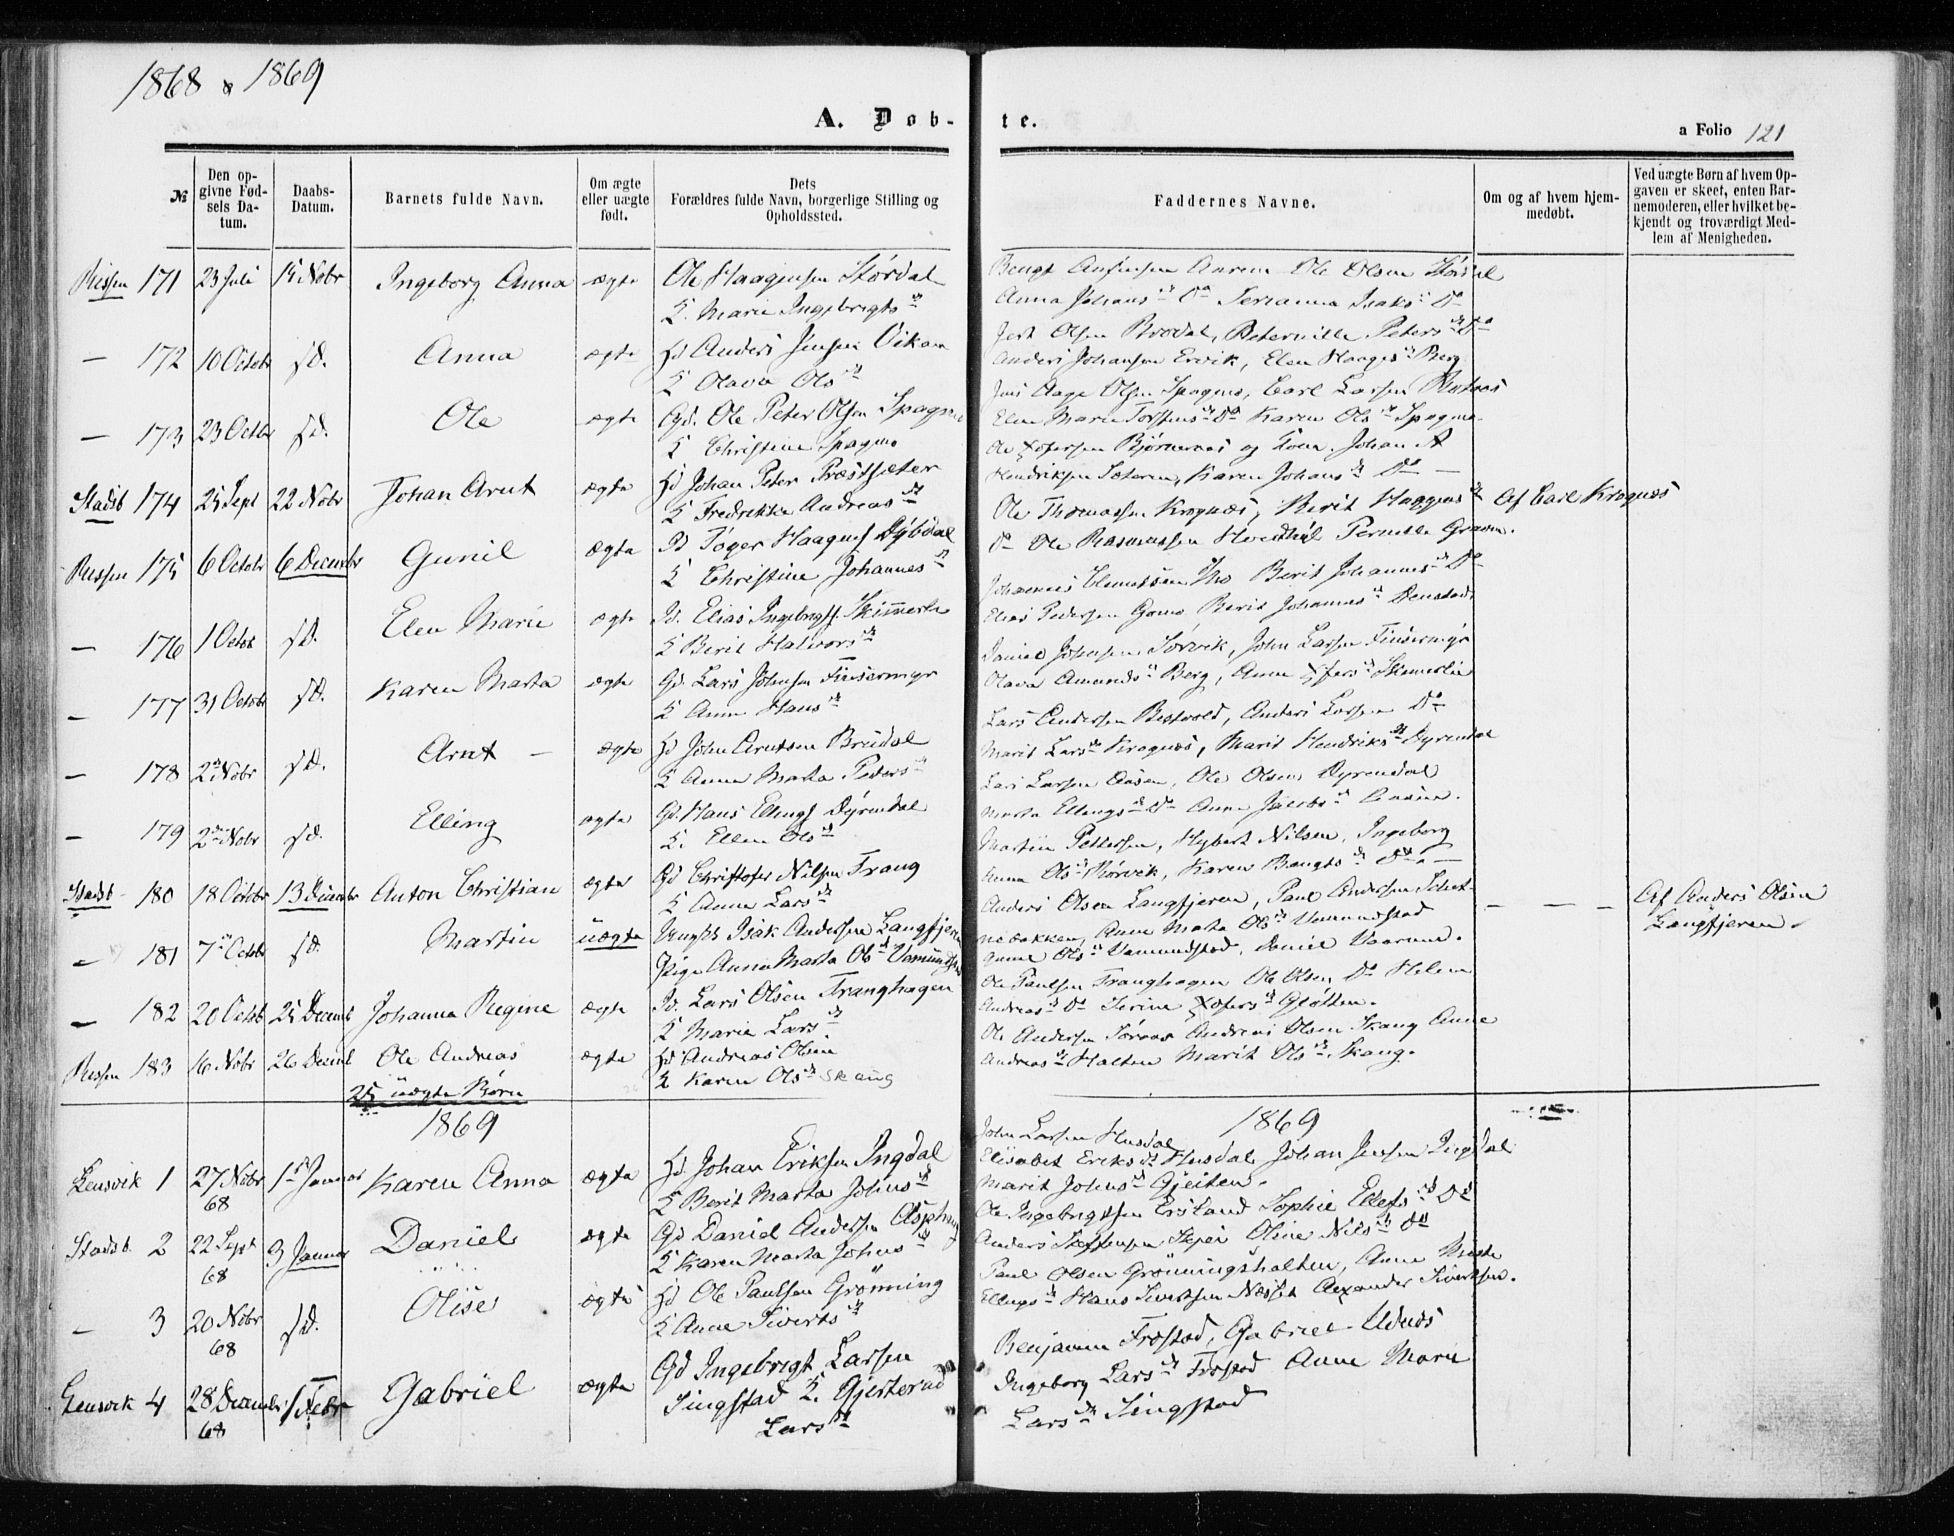 SAT, Ministerialprotokoller, klokkerbøker og fødselsregistre - Sør-Trøndelag, 646/L0612: Parish register (official) no. 646A10, 1858-1869, p. 121